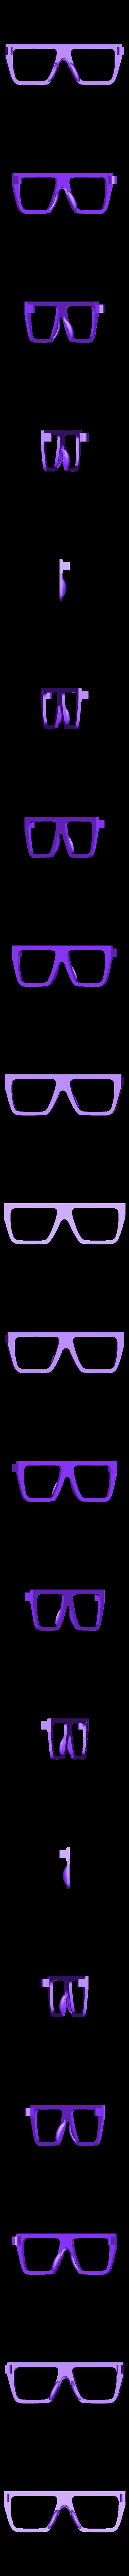 will_two_Frame.stl Download free STL file POP Glasses • 3D printable template, SimonePDA